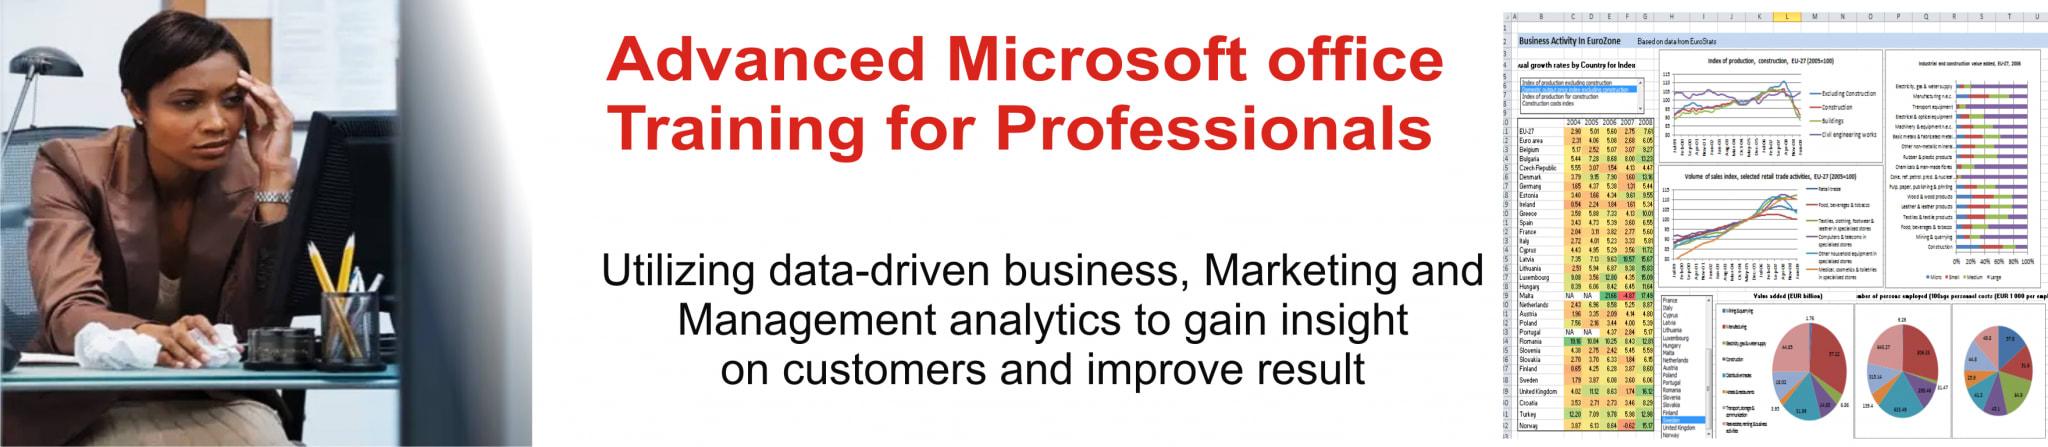 Advanced-Microsoft-office